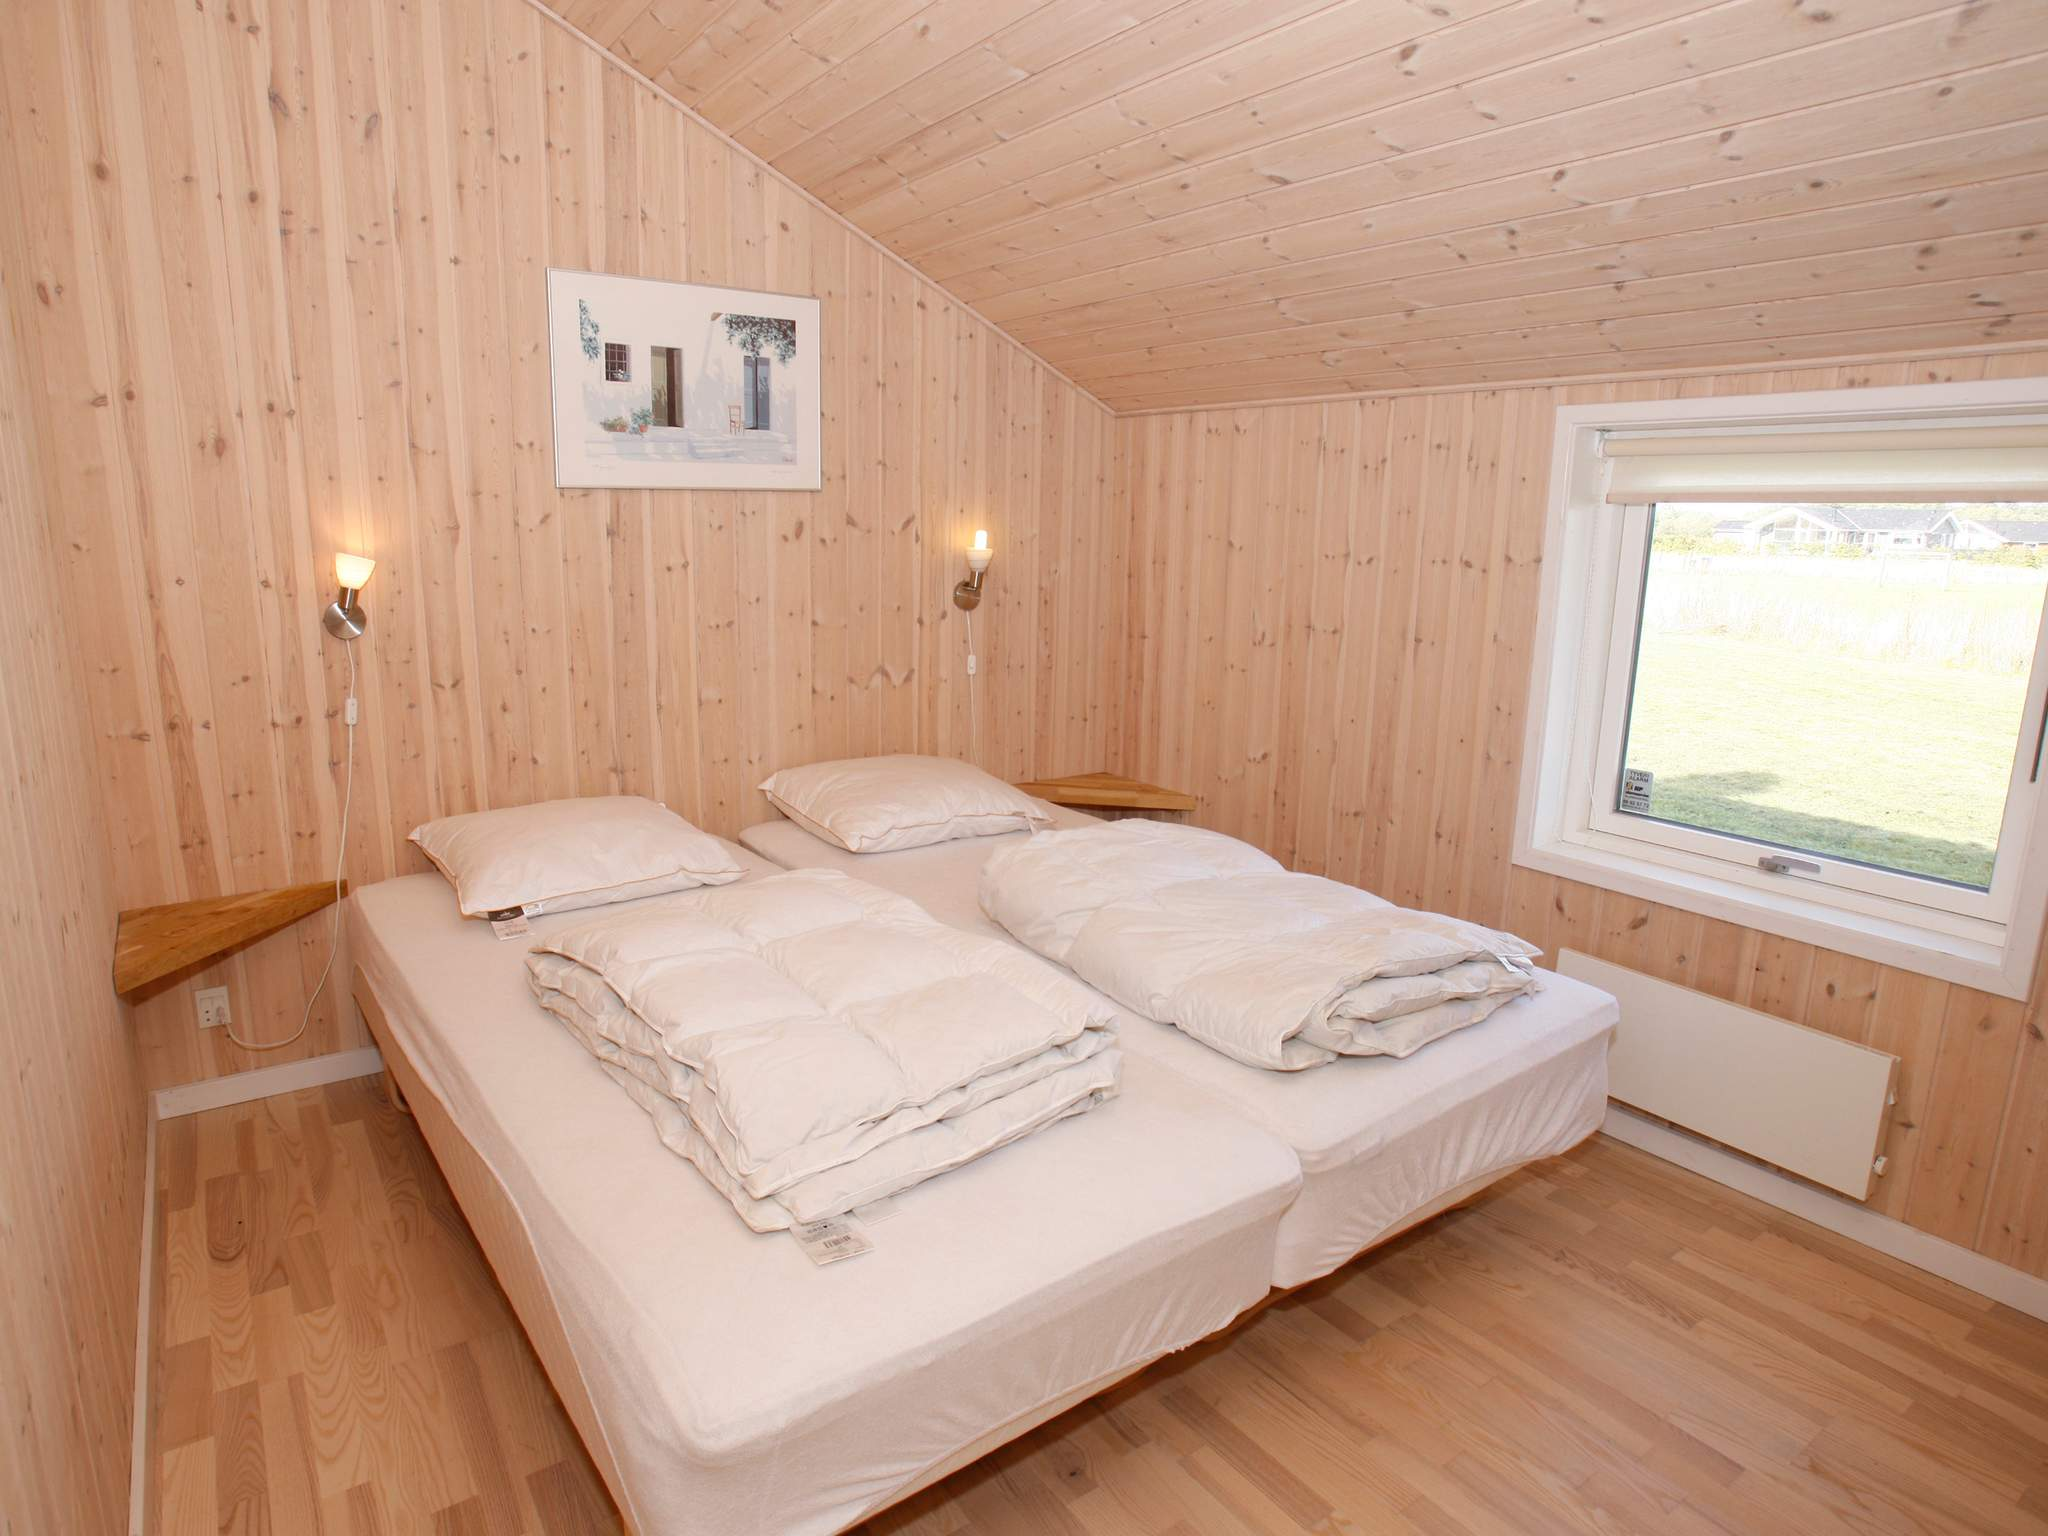 Ferienhaus Øster Hurup (681777), Øster Hurup, , Dänische Ostsee, Dänemark, Bild 7